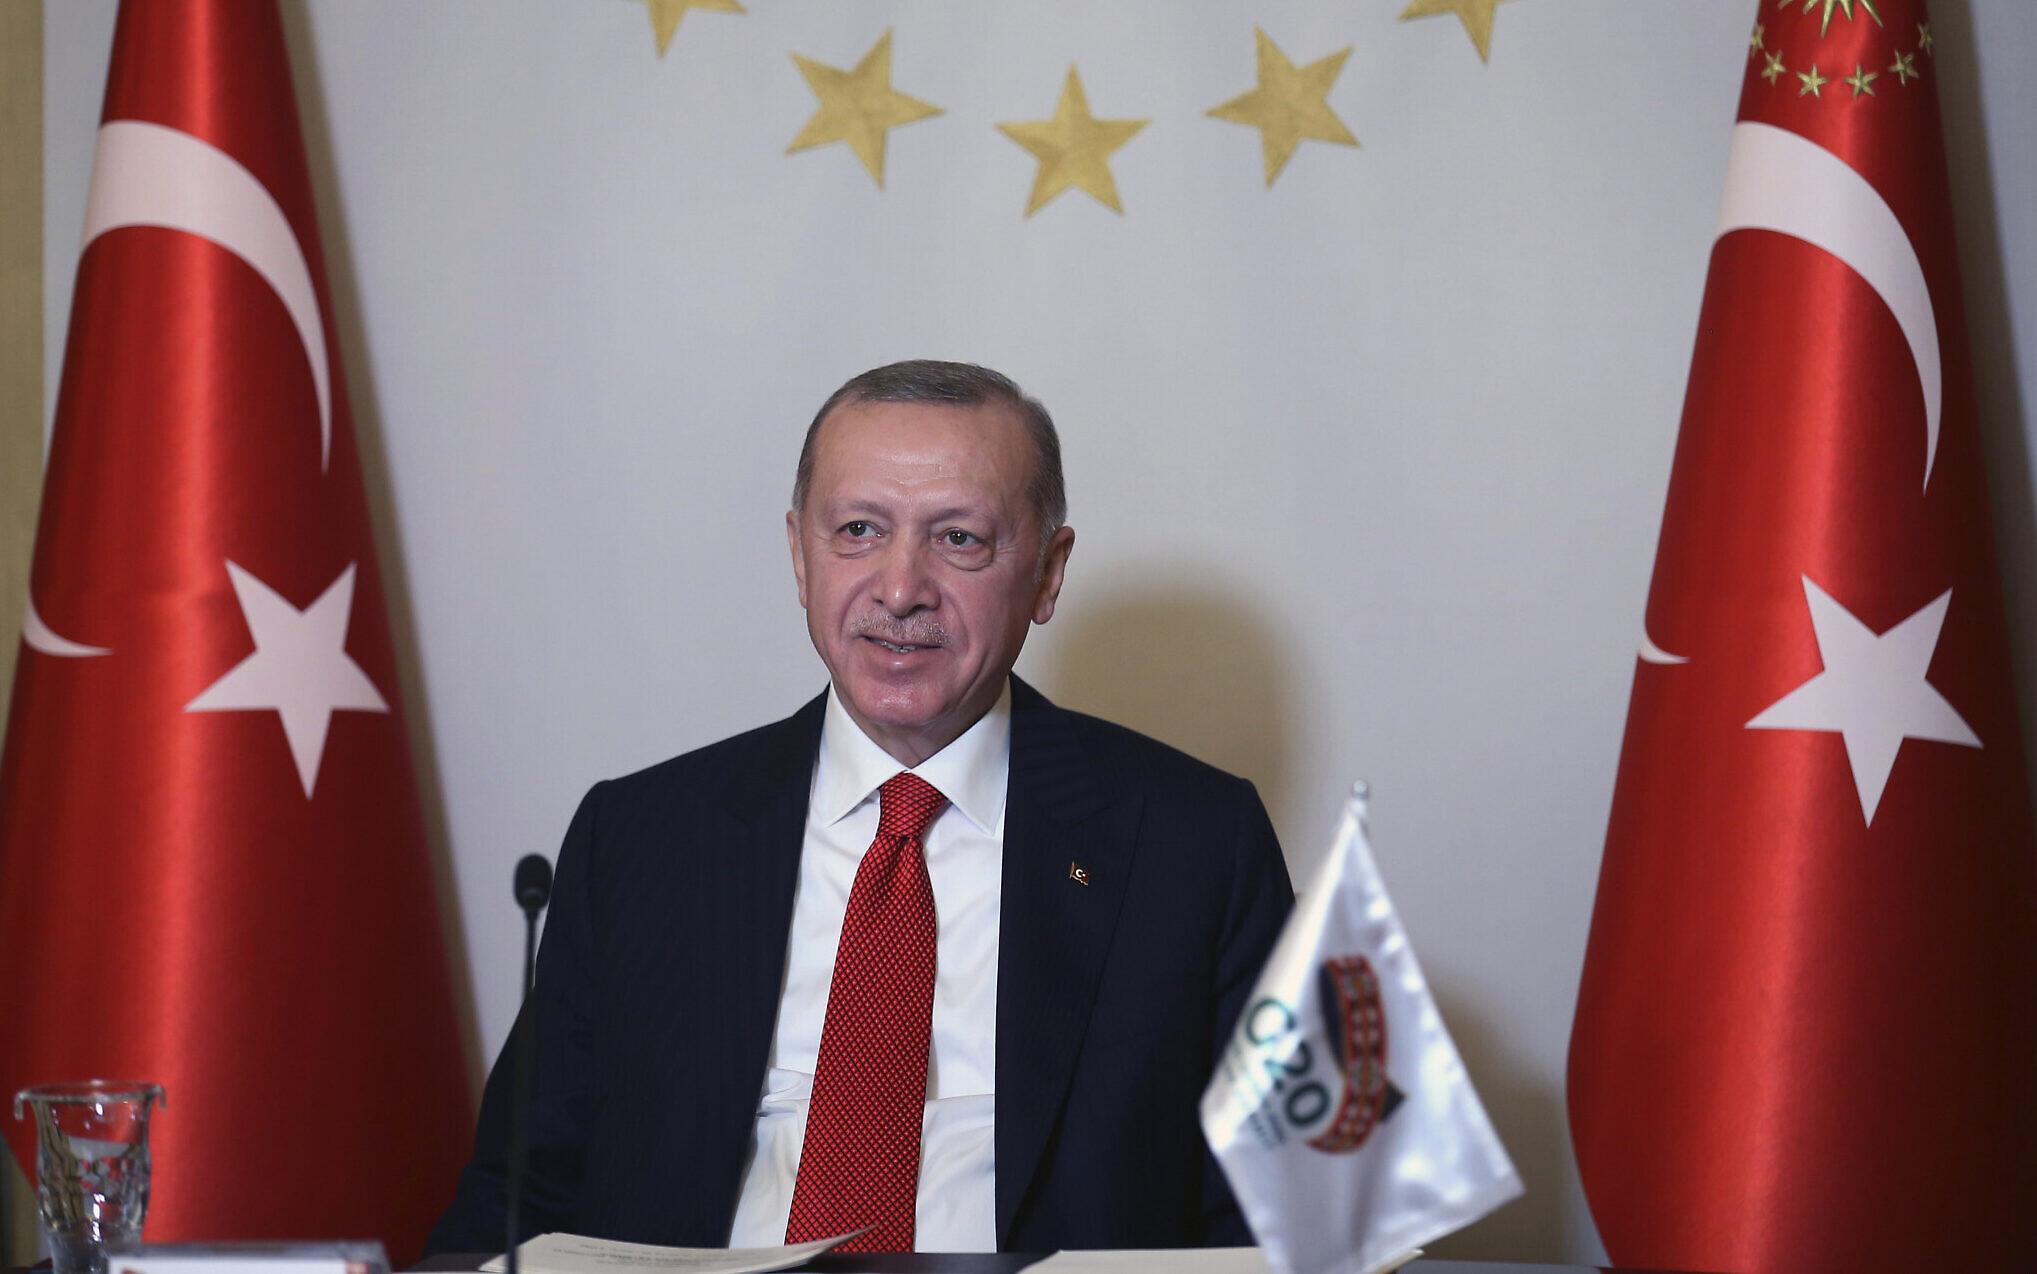 Turkish court sentences hundreds to life imprisonment over unproven coup claims